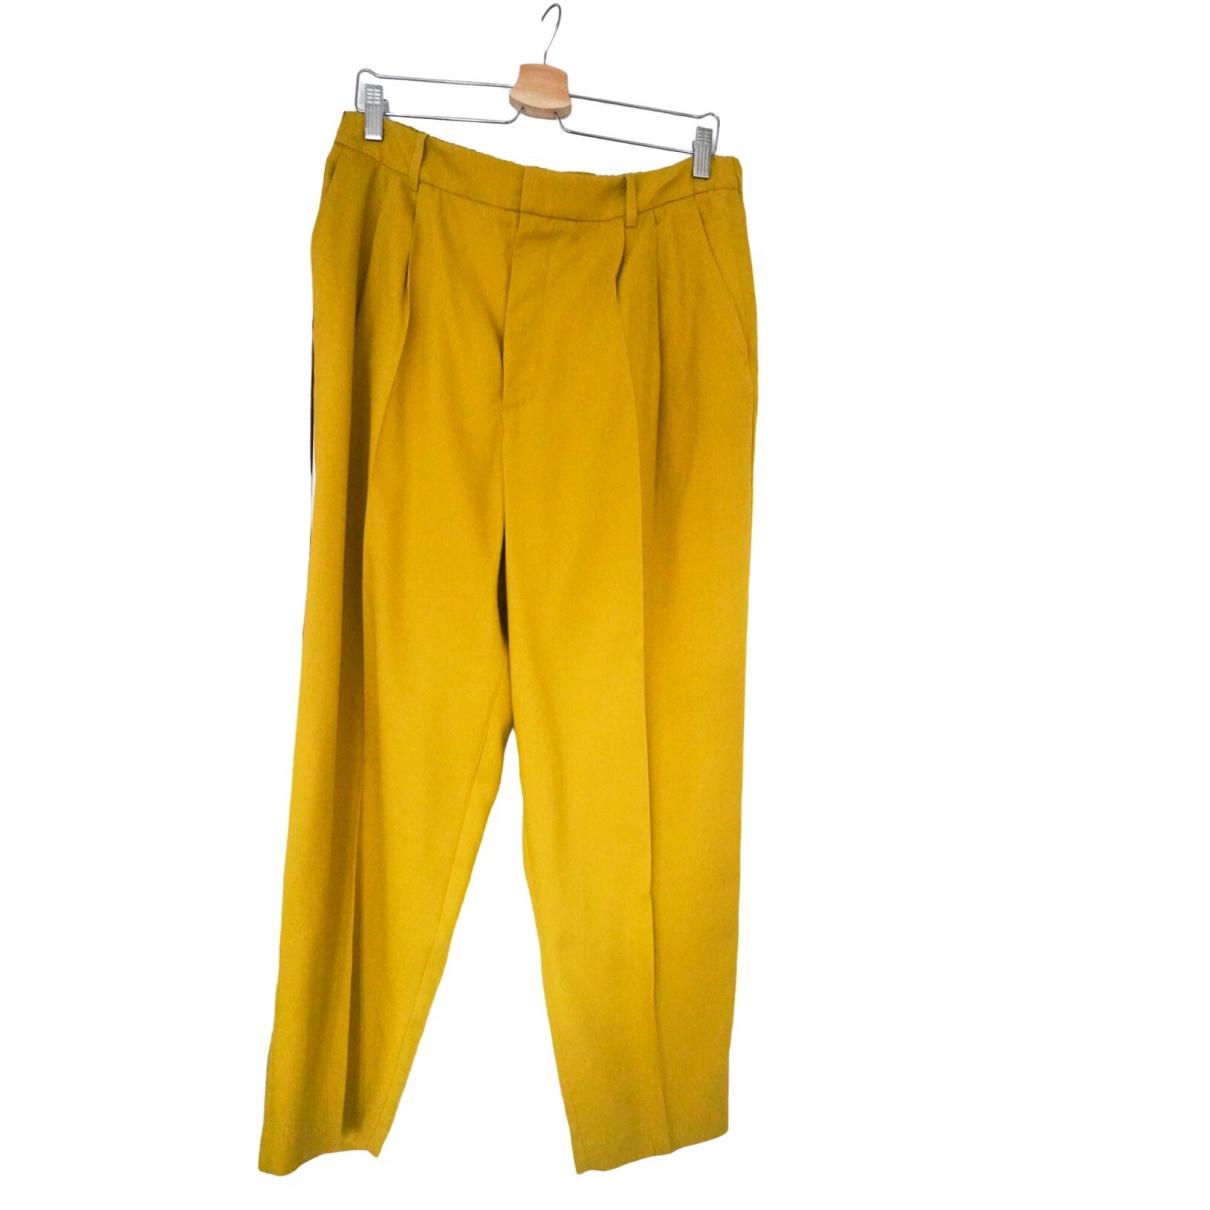 Zara \N Cotton Trousers for Women L International